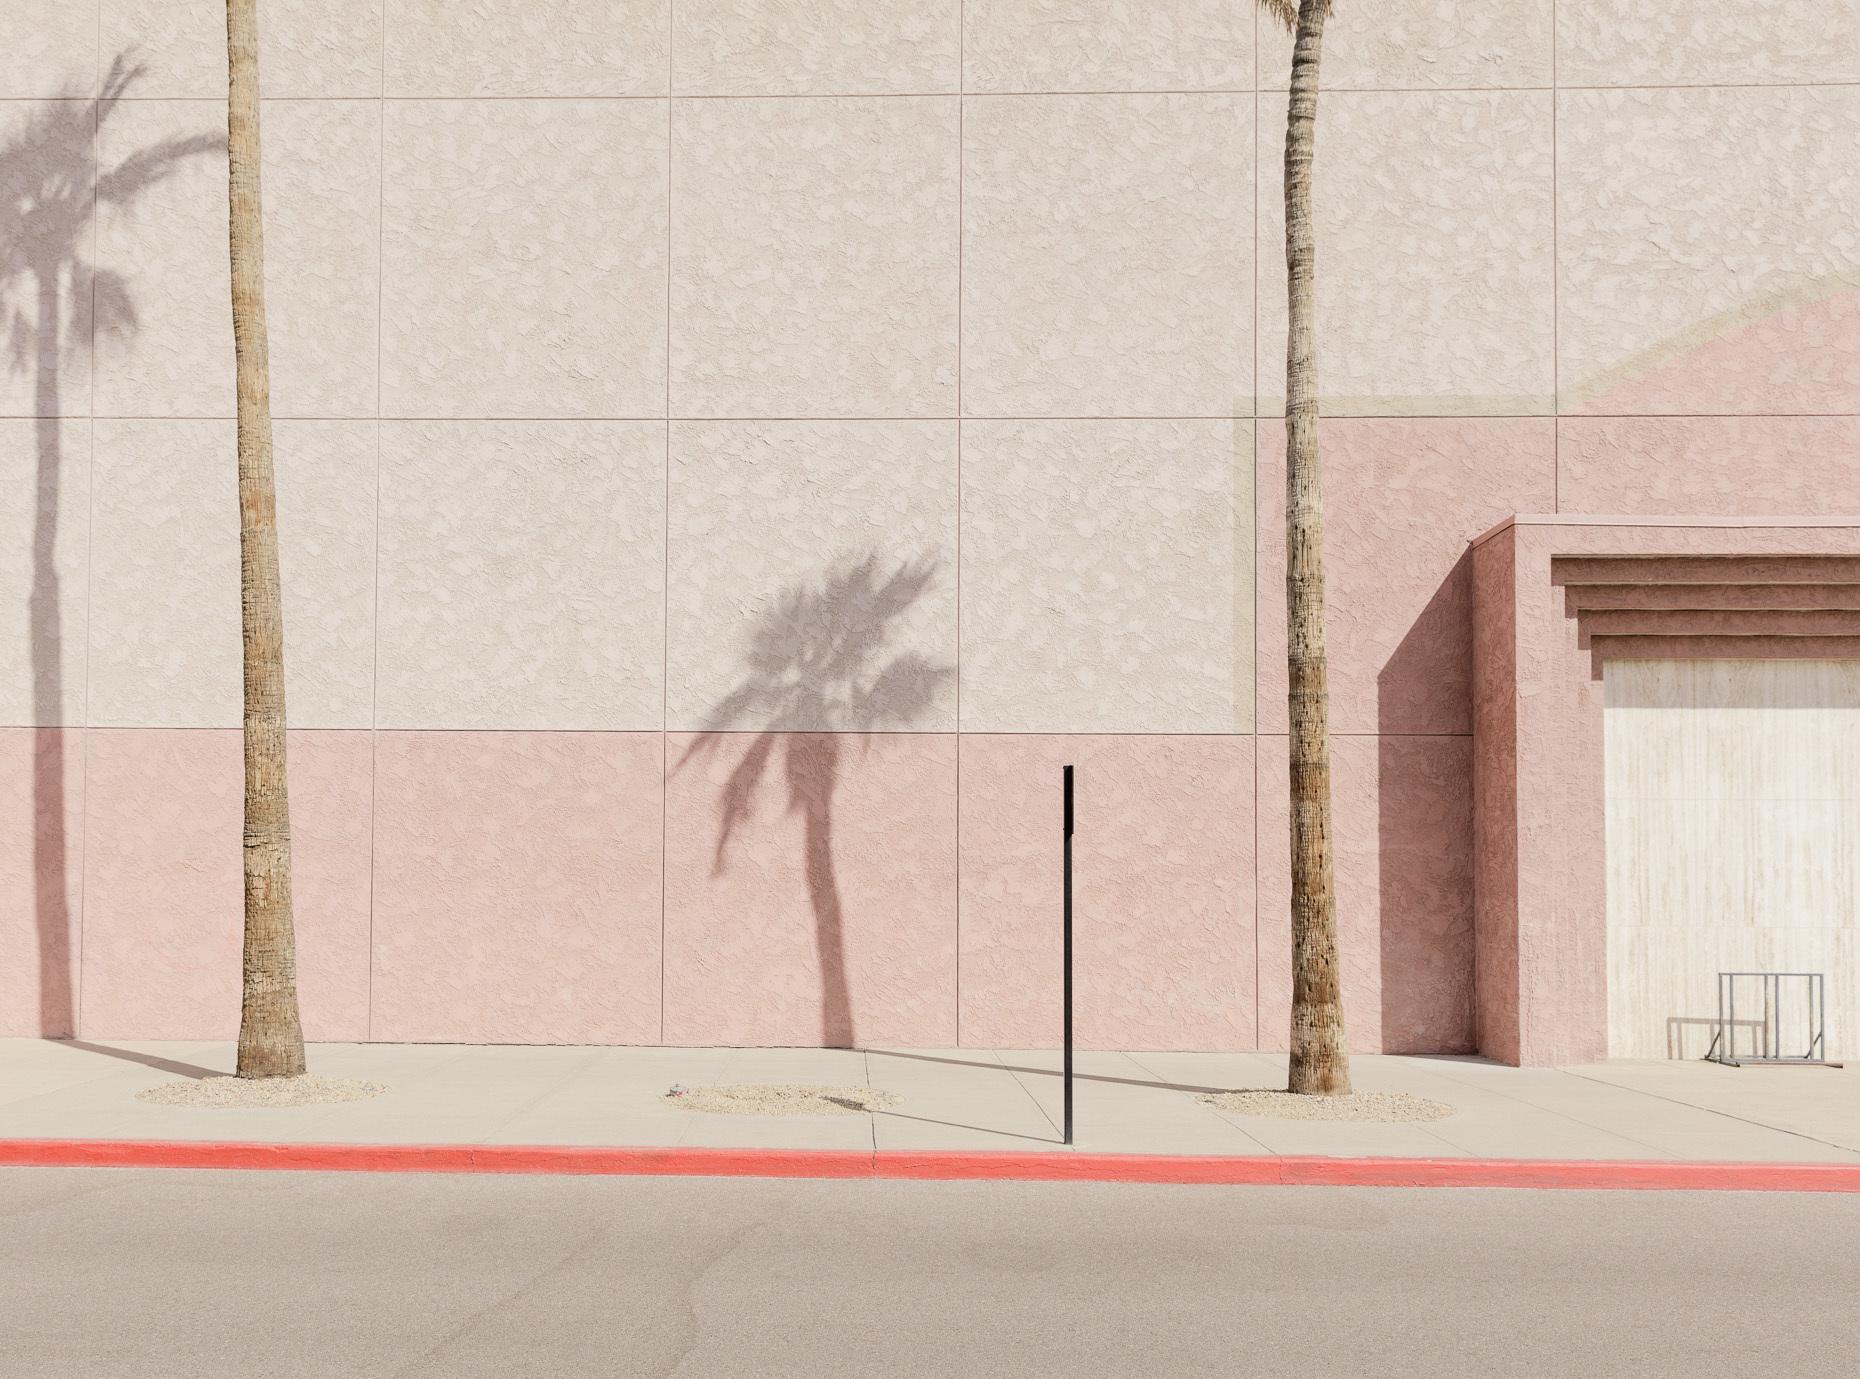 New environments 18